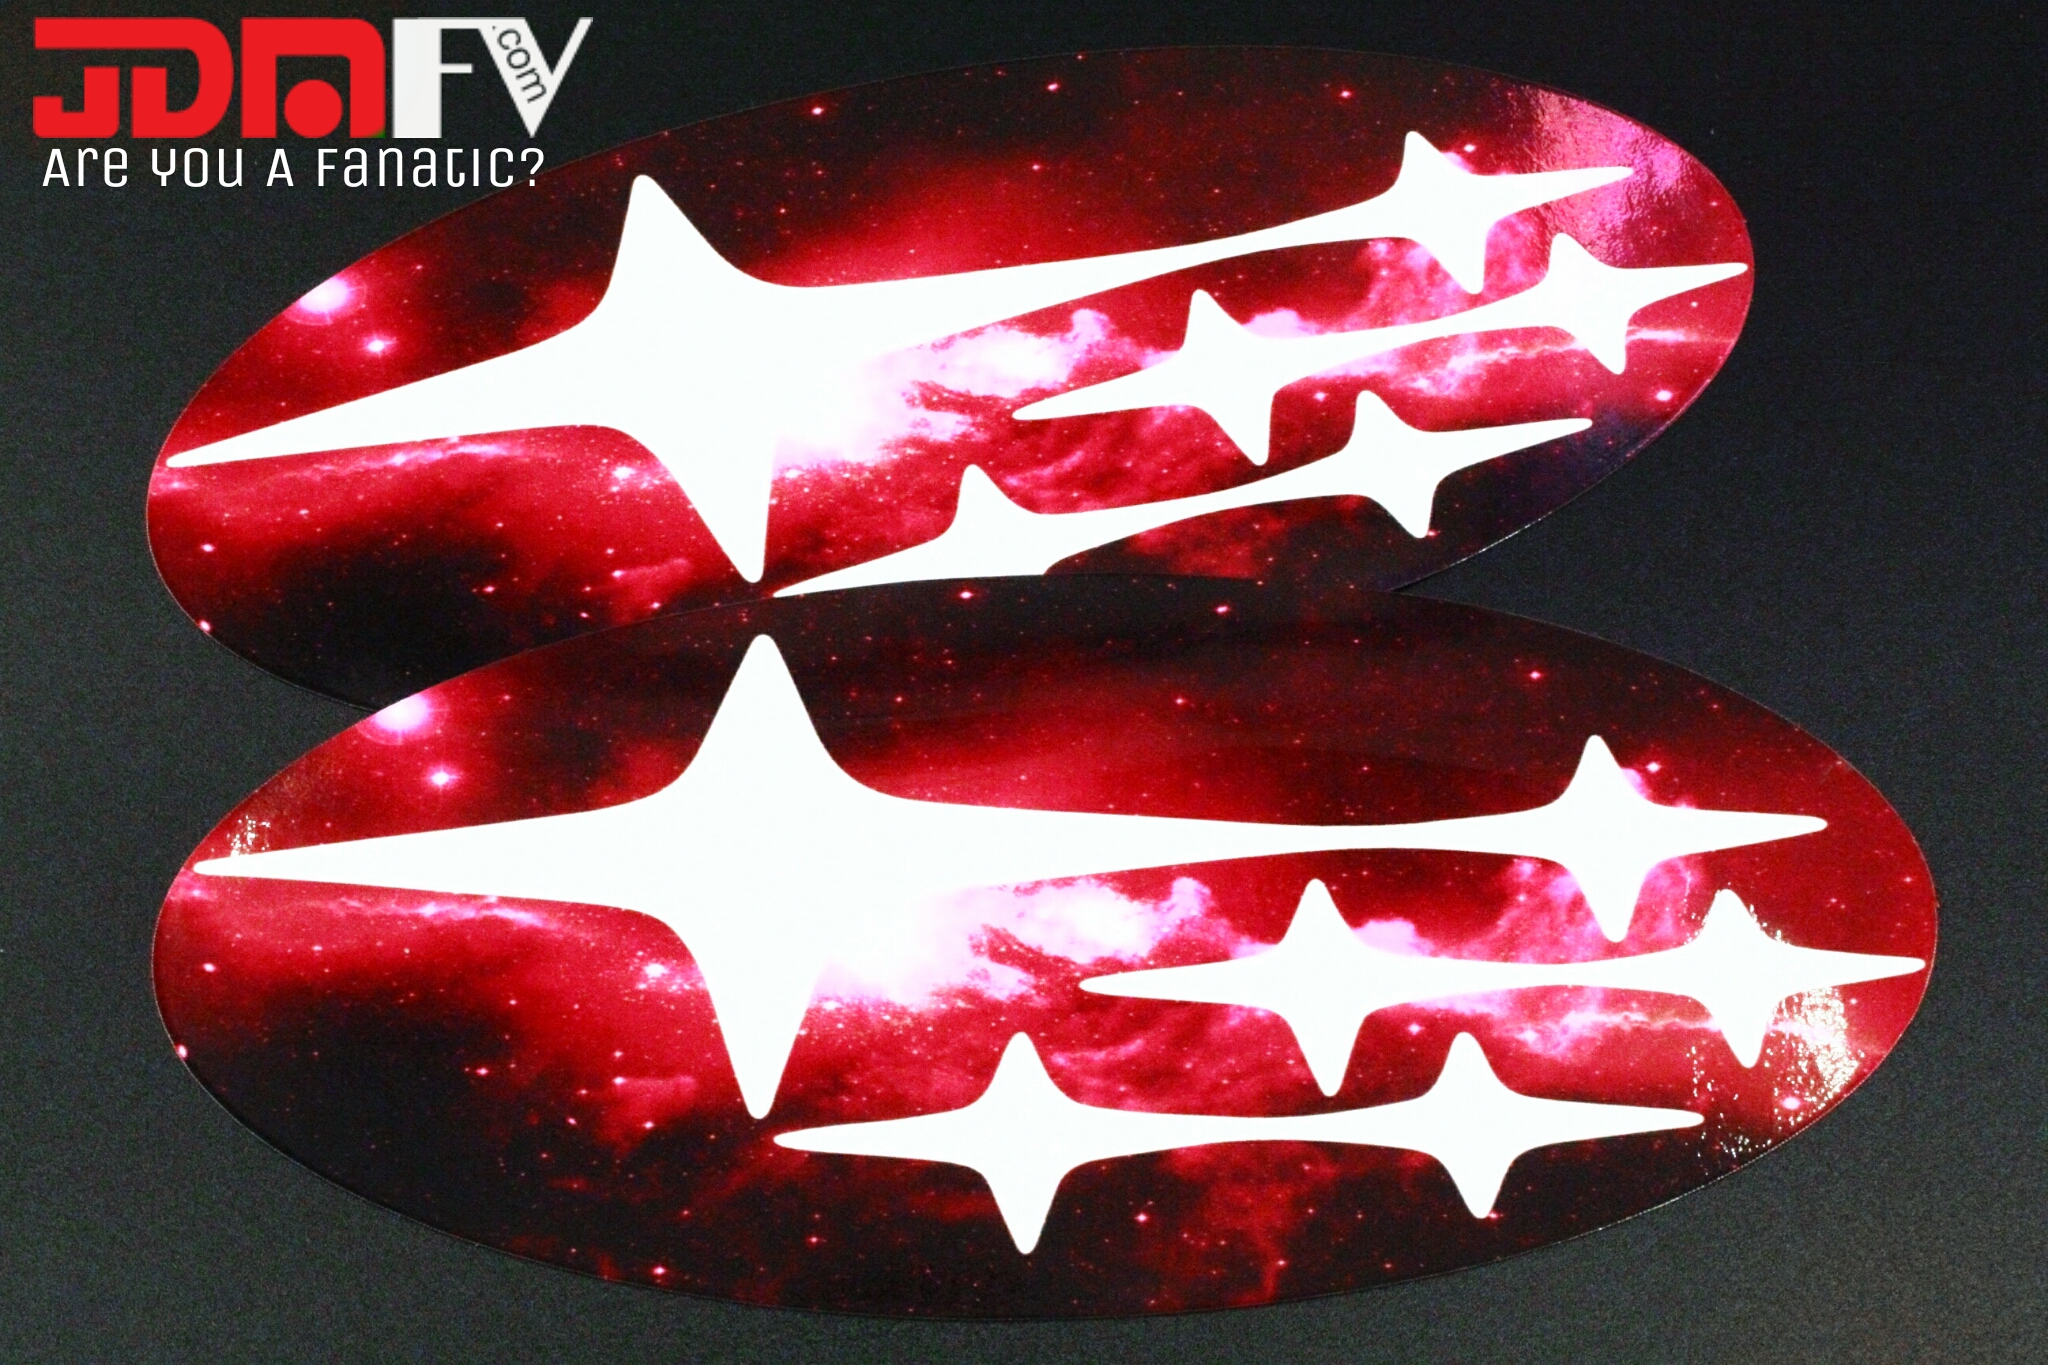 red-galaxy-emblem-overlays-jdmfv.jpg